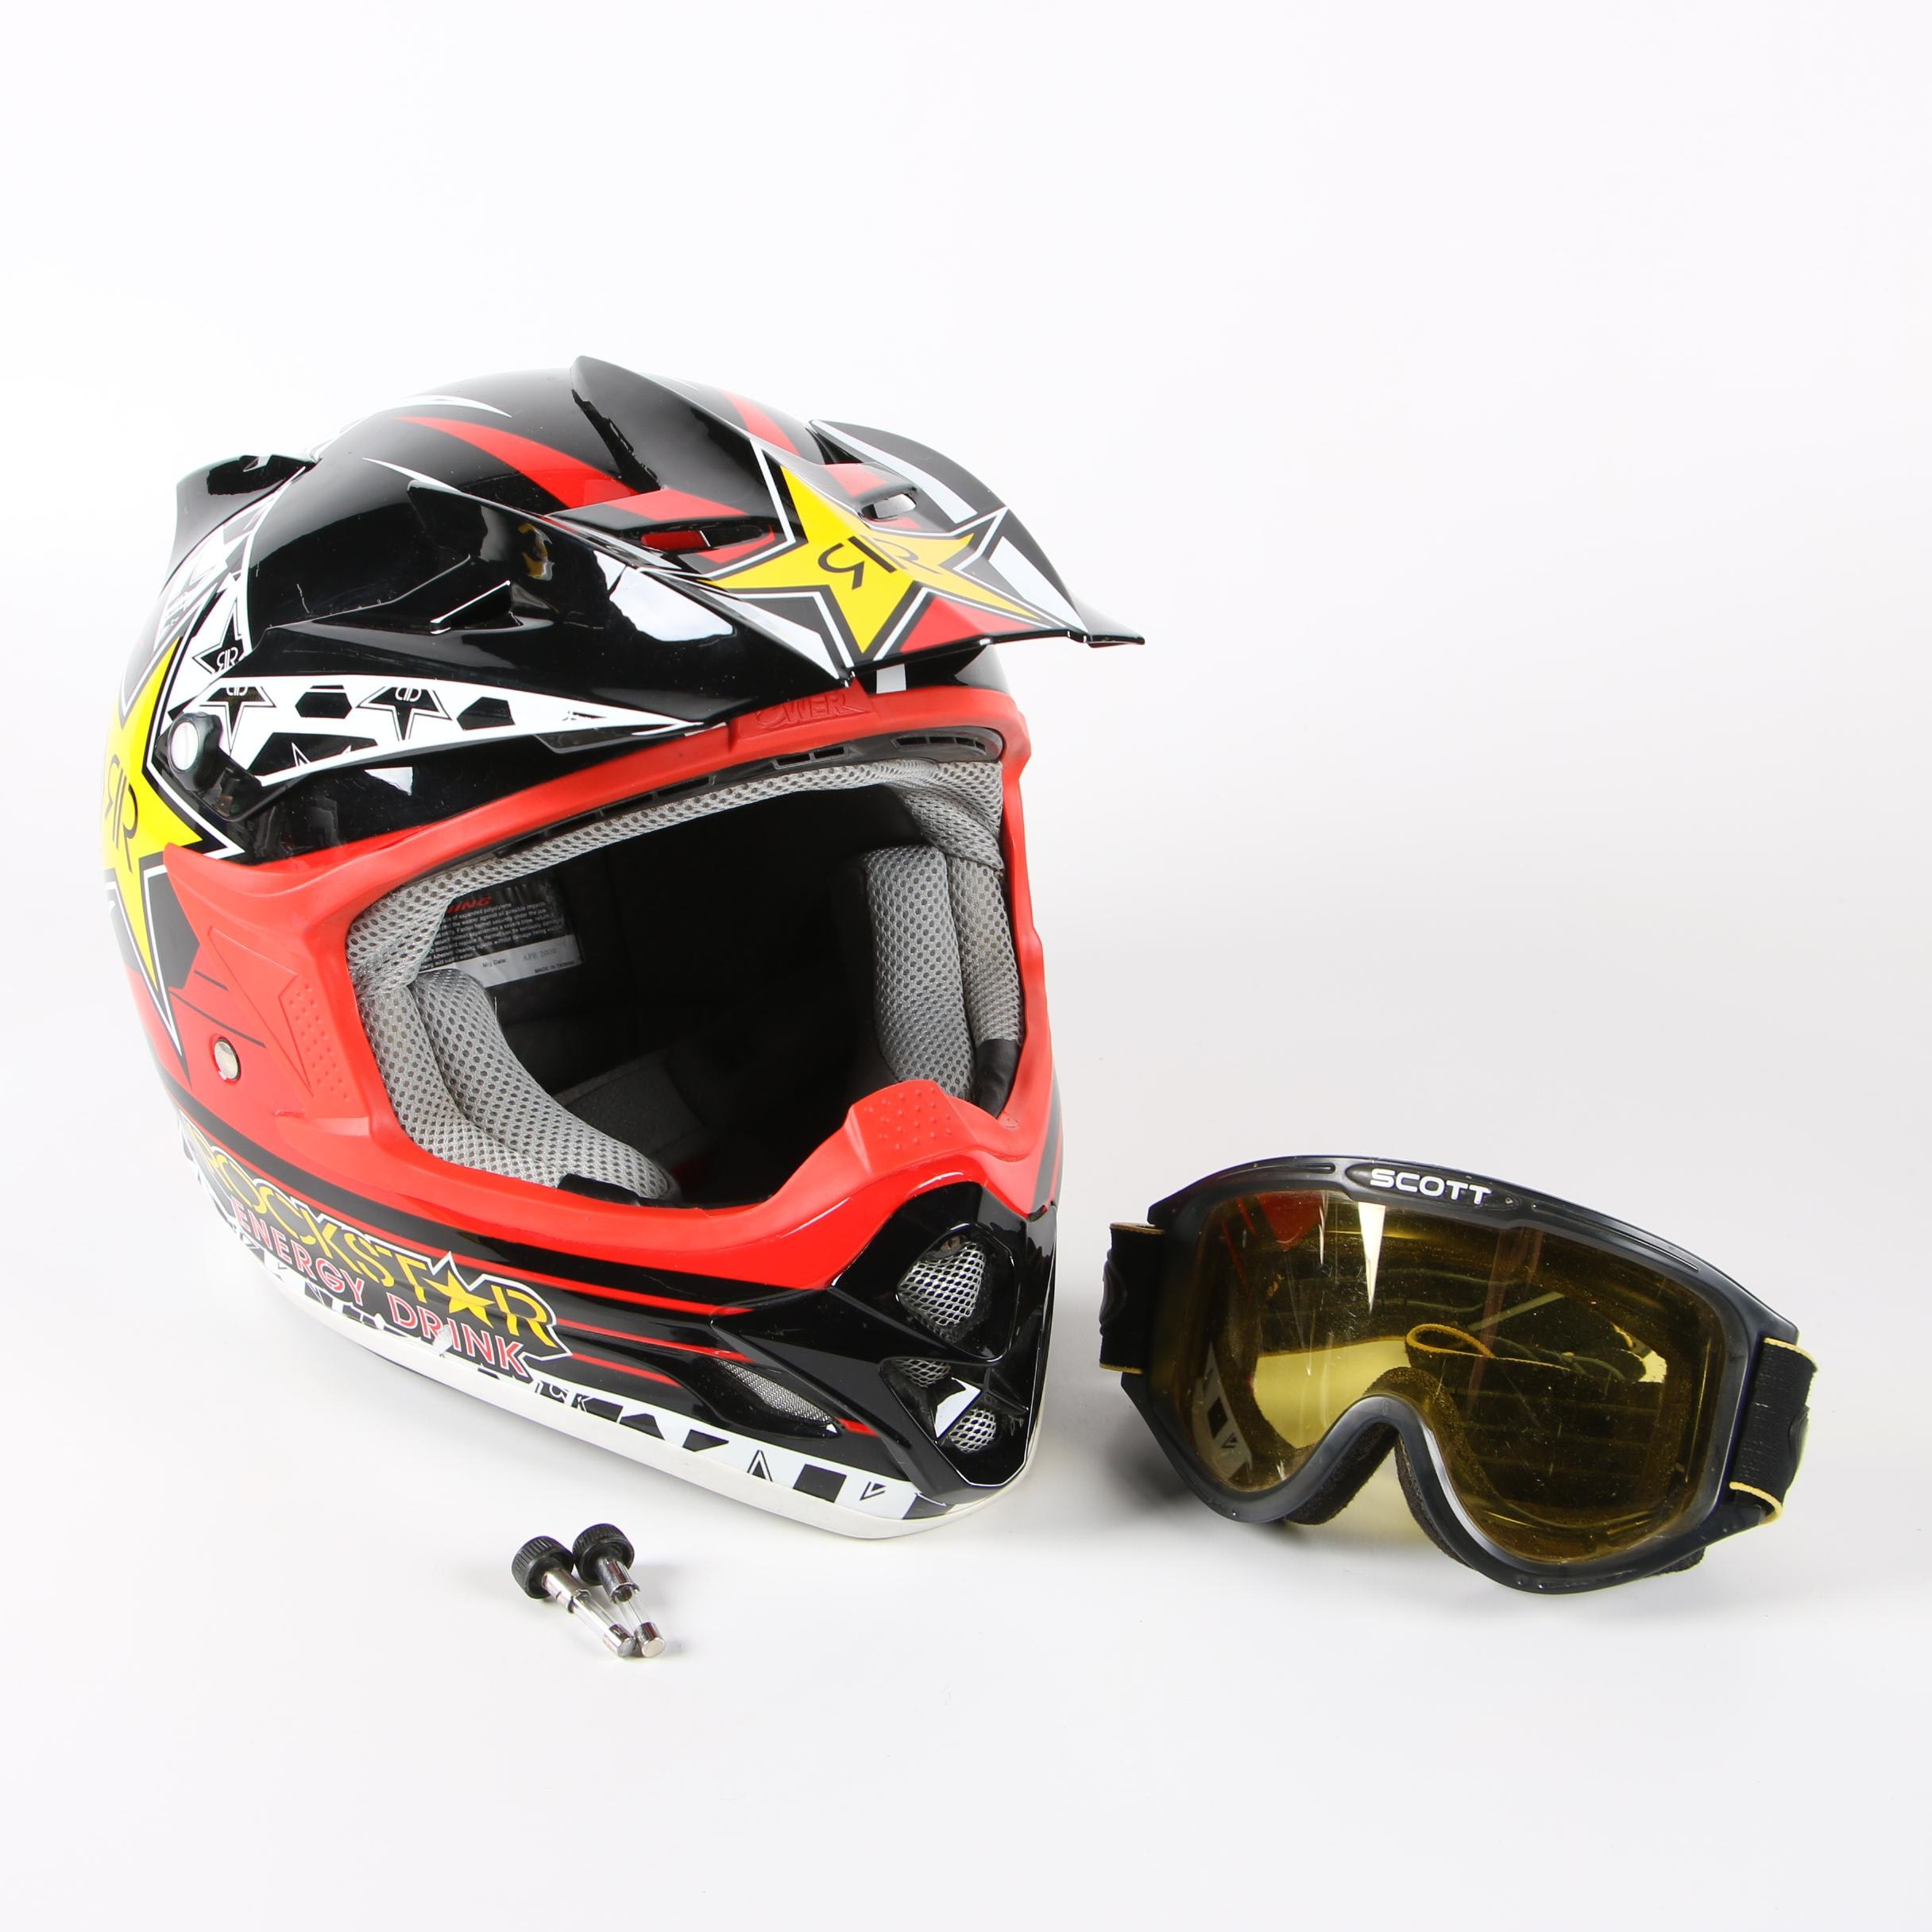 Rockstar Advertising Motocross XL Capacete Helmet with Goggles